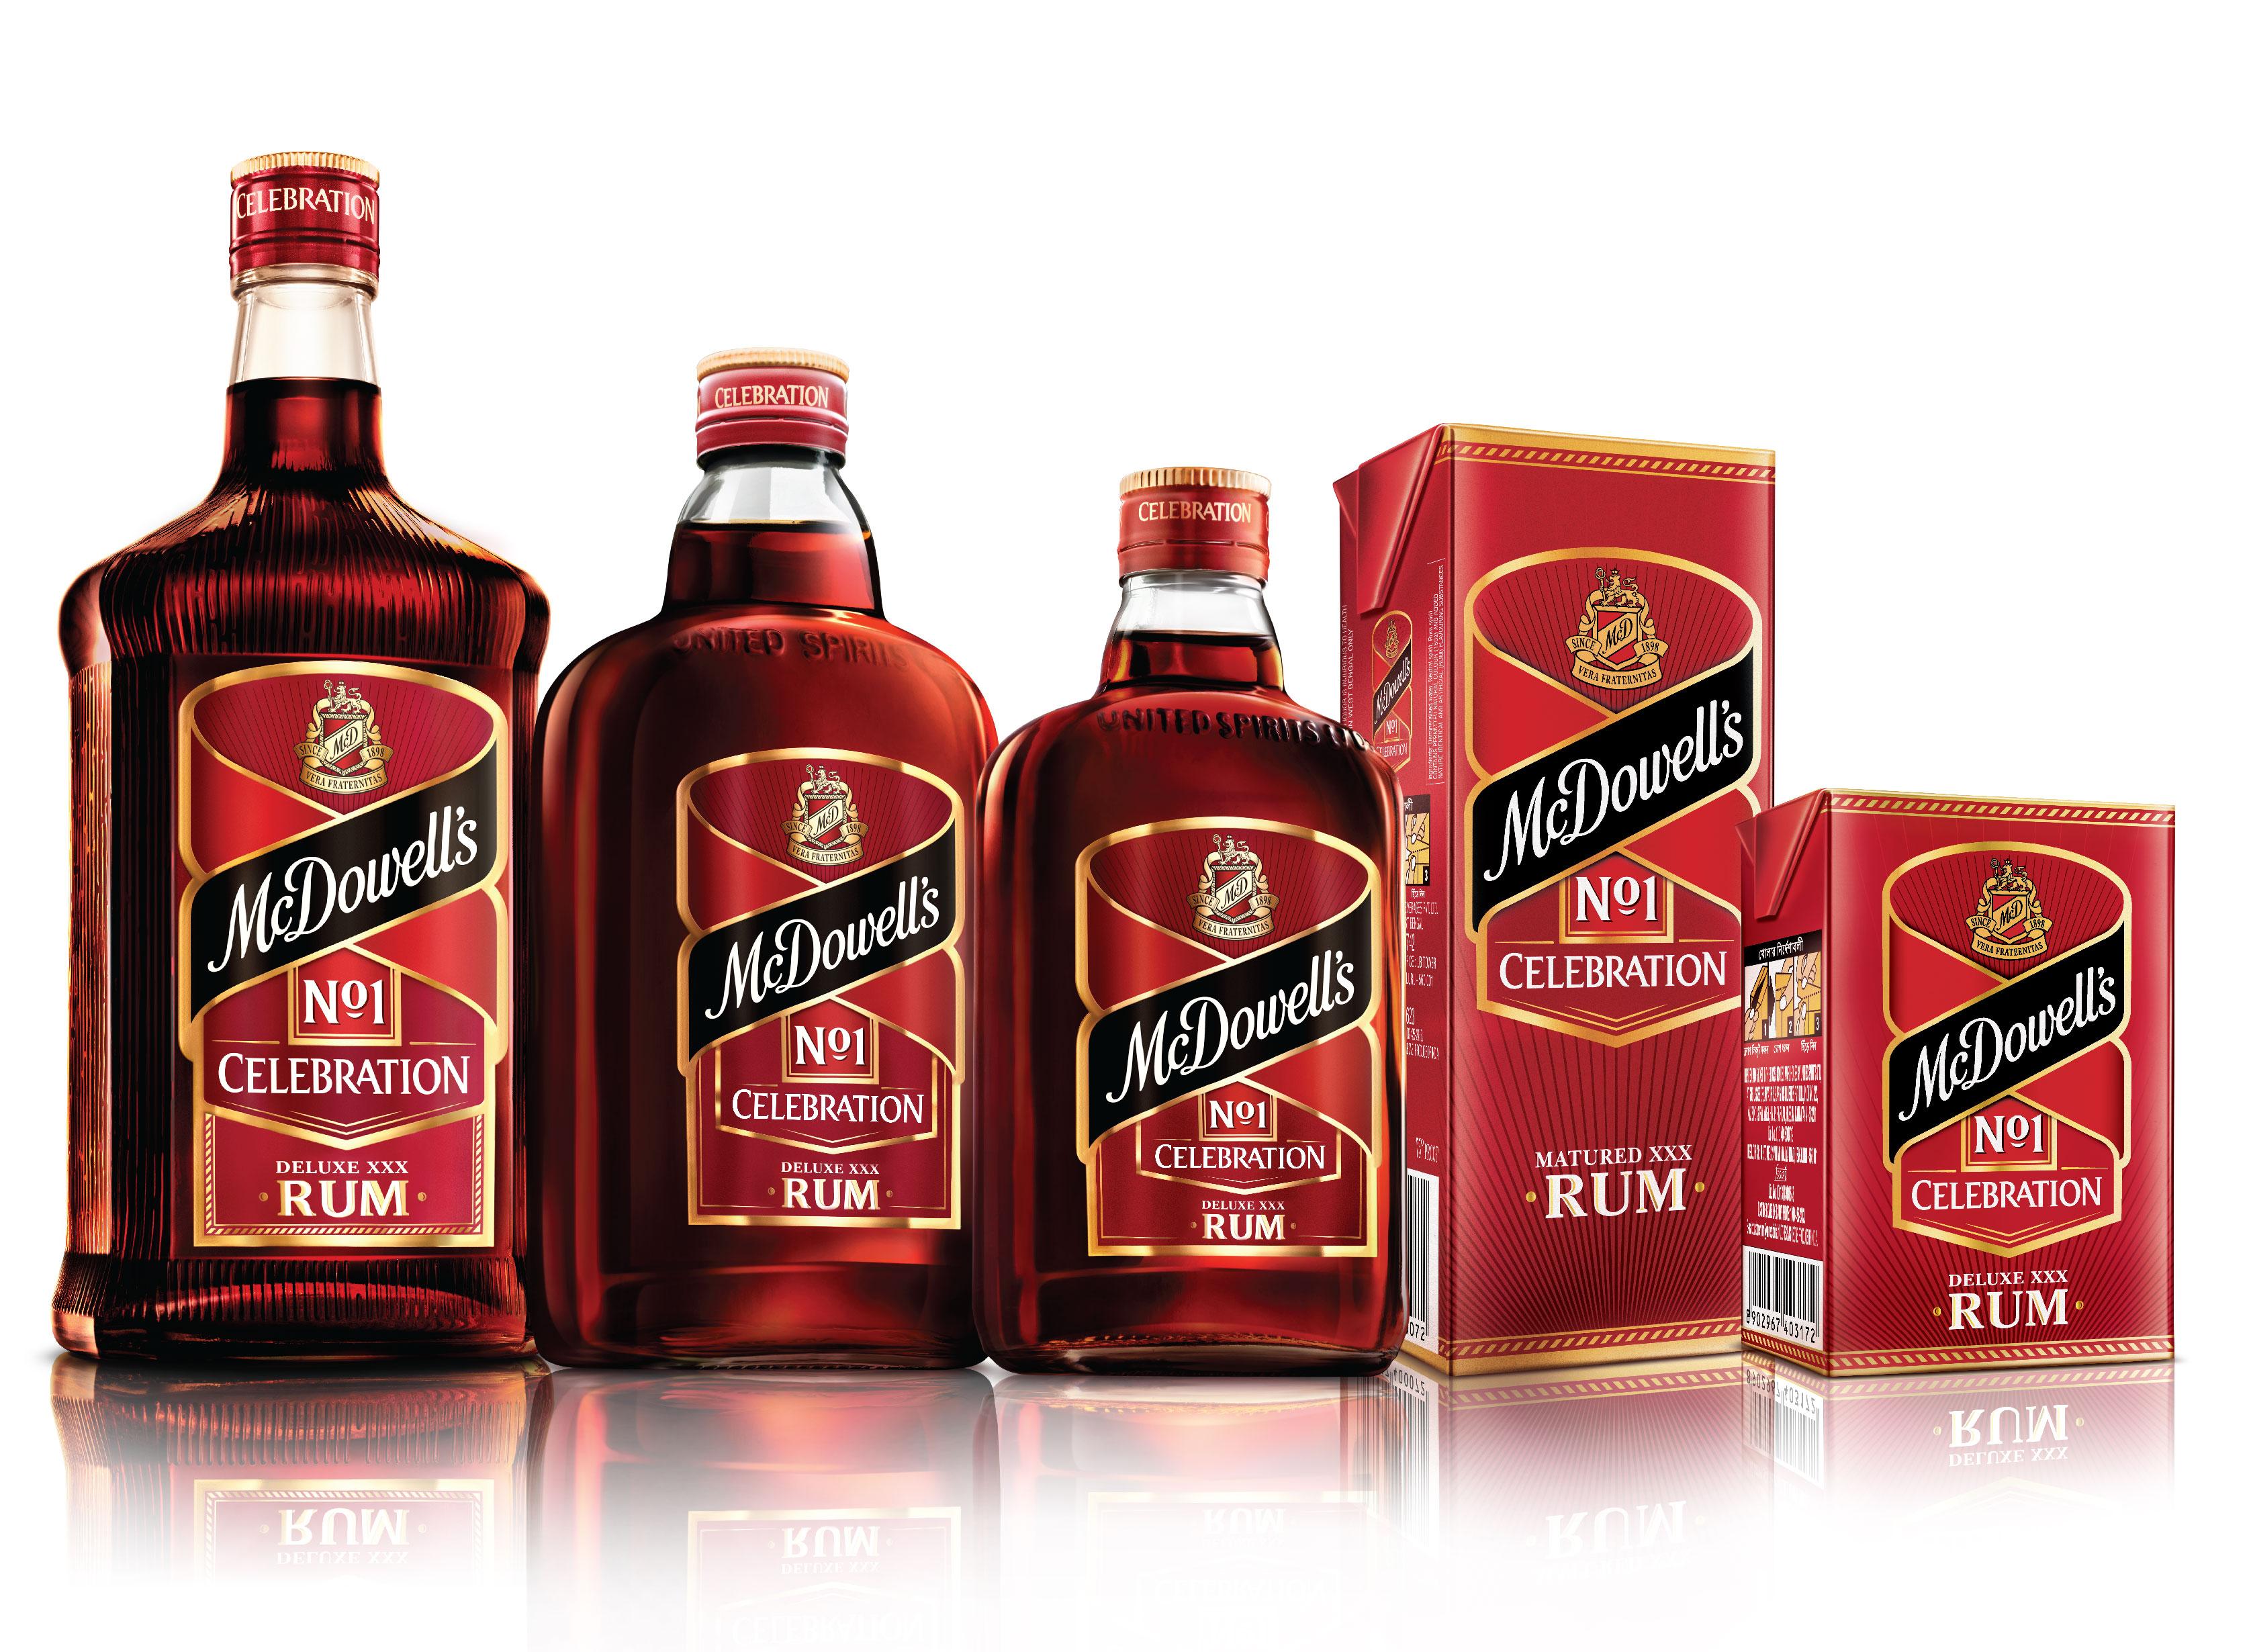 McDowell's No.1 Celebration Rum